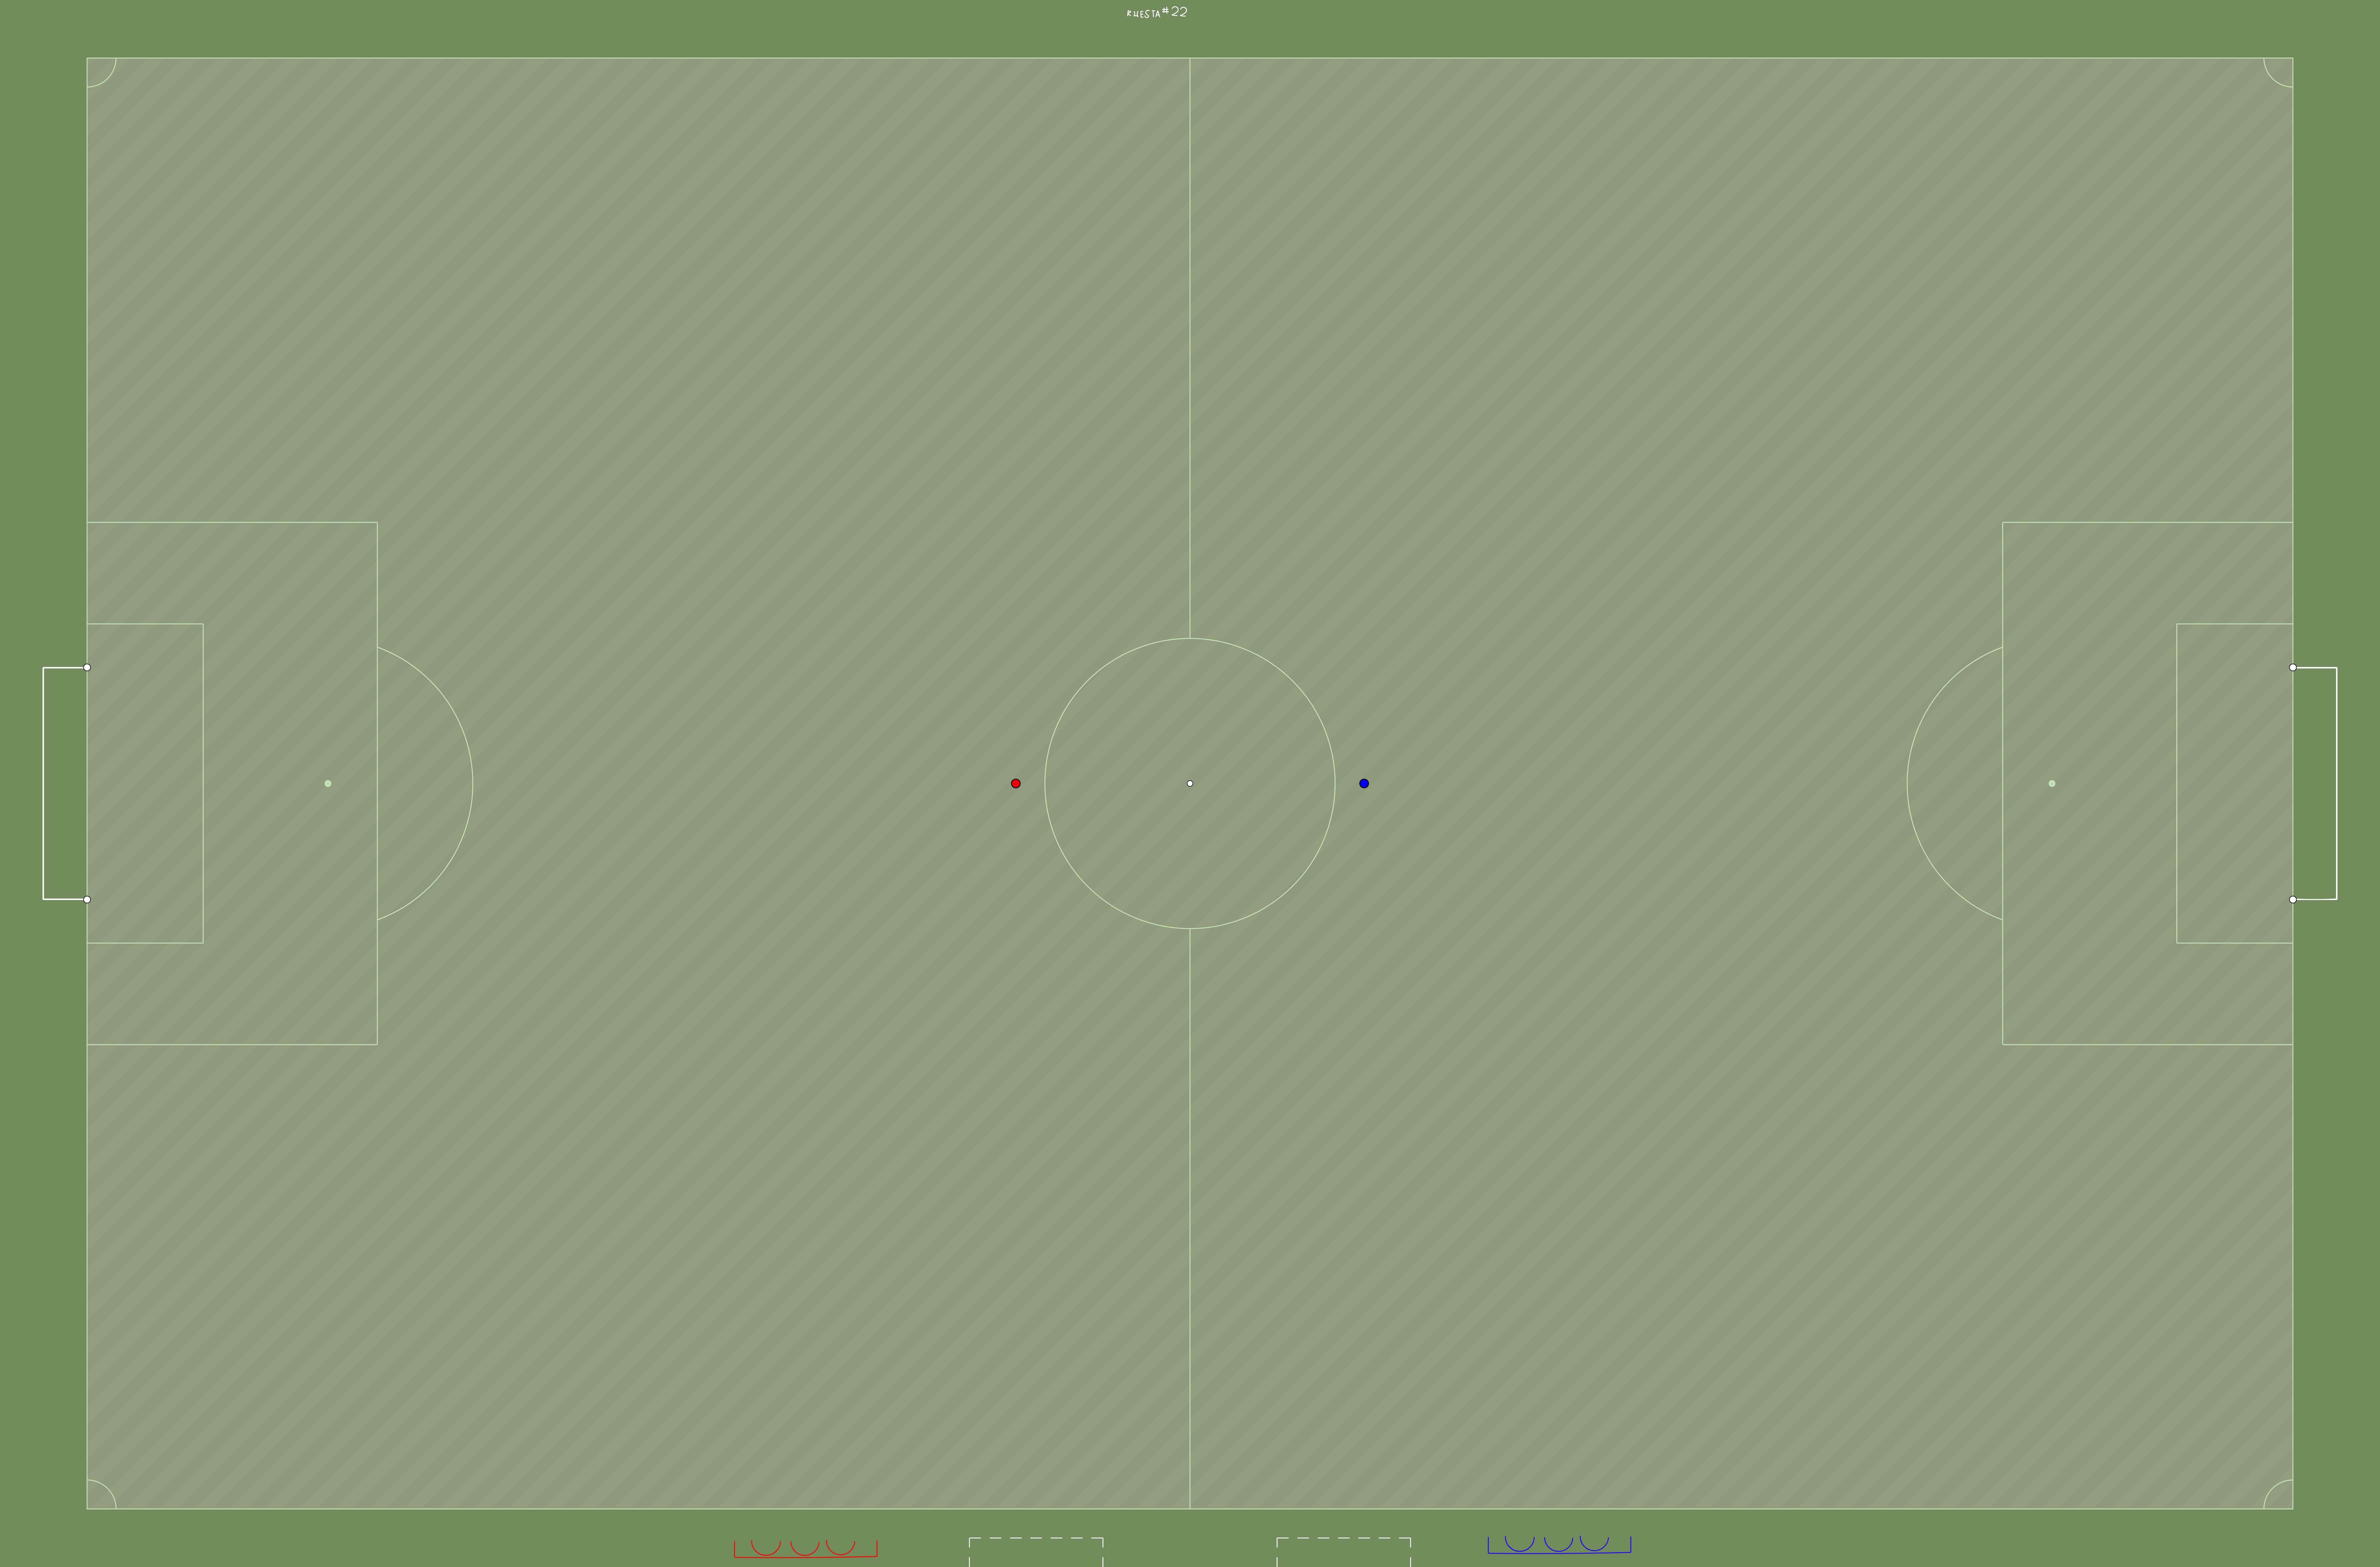 hax ball maps | Real Soccer x11